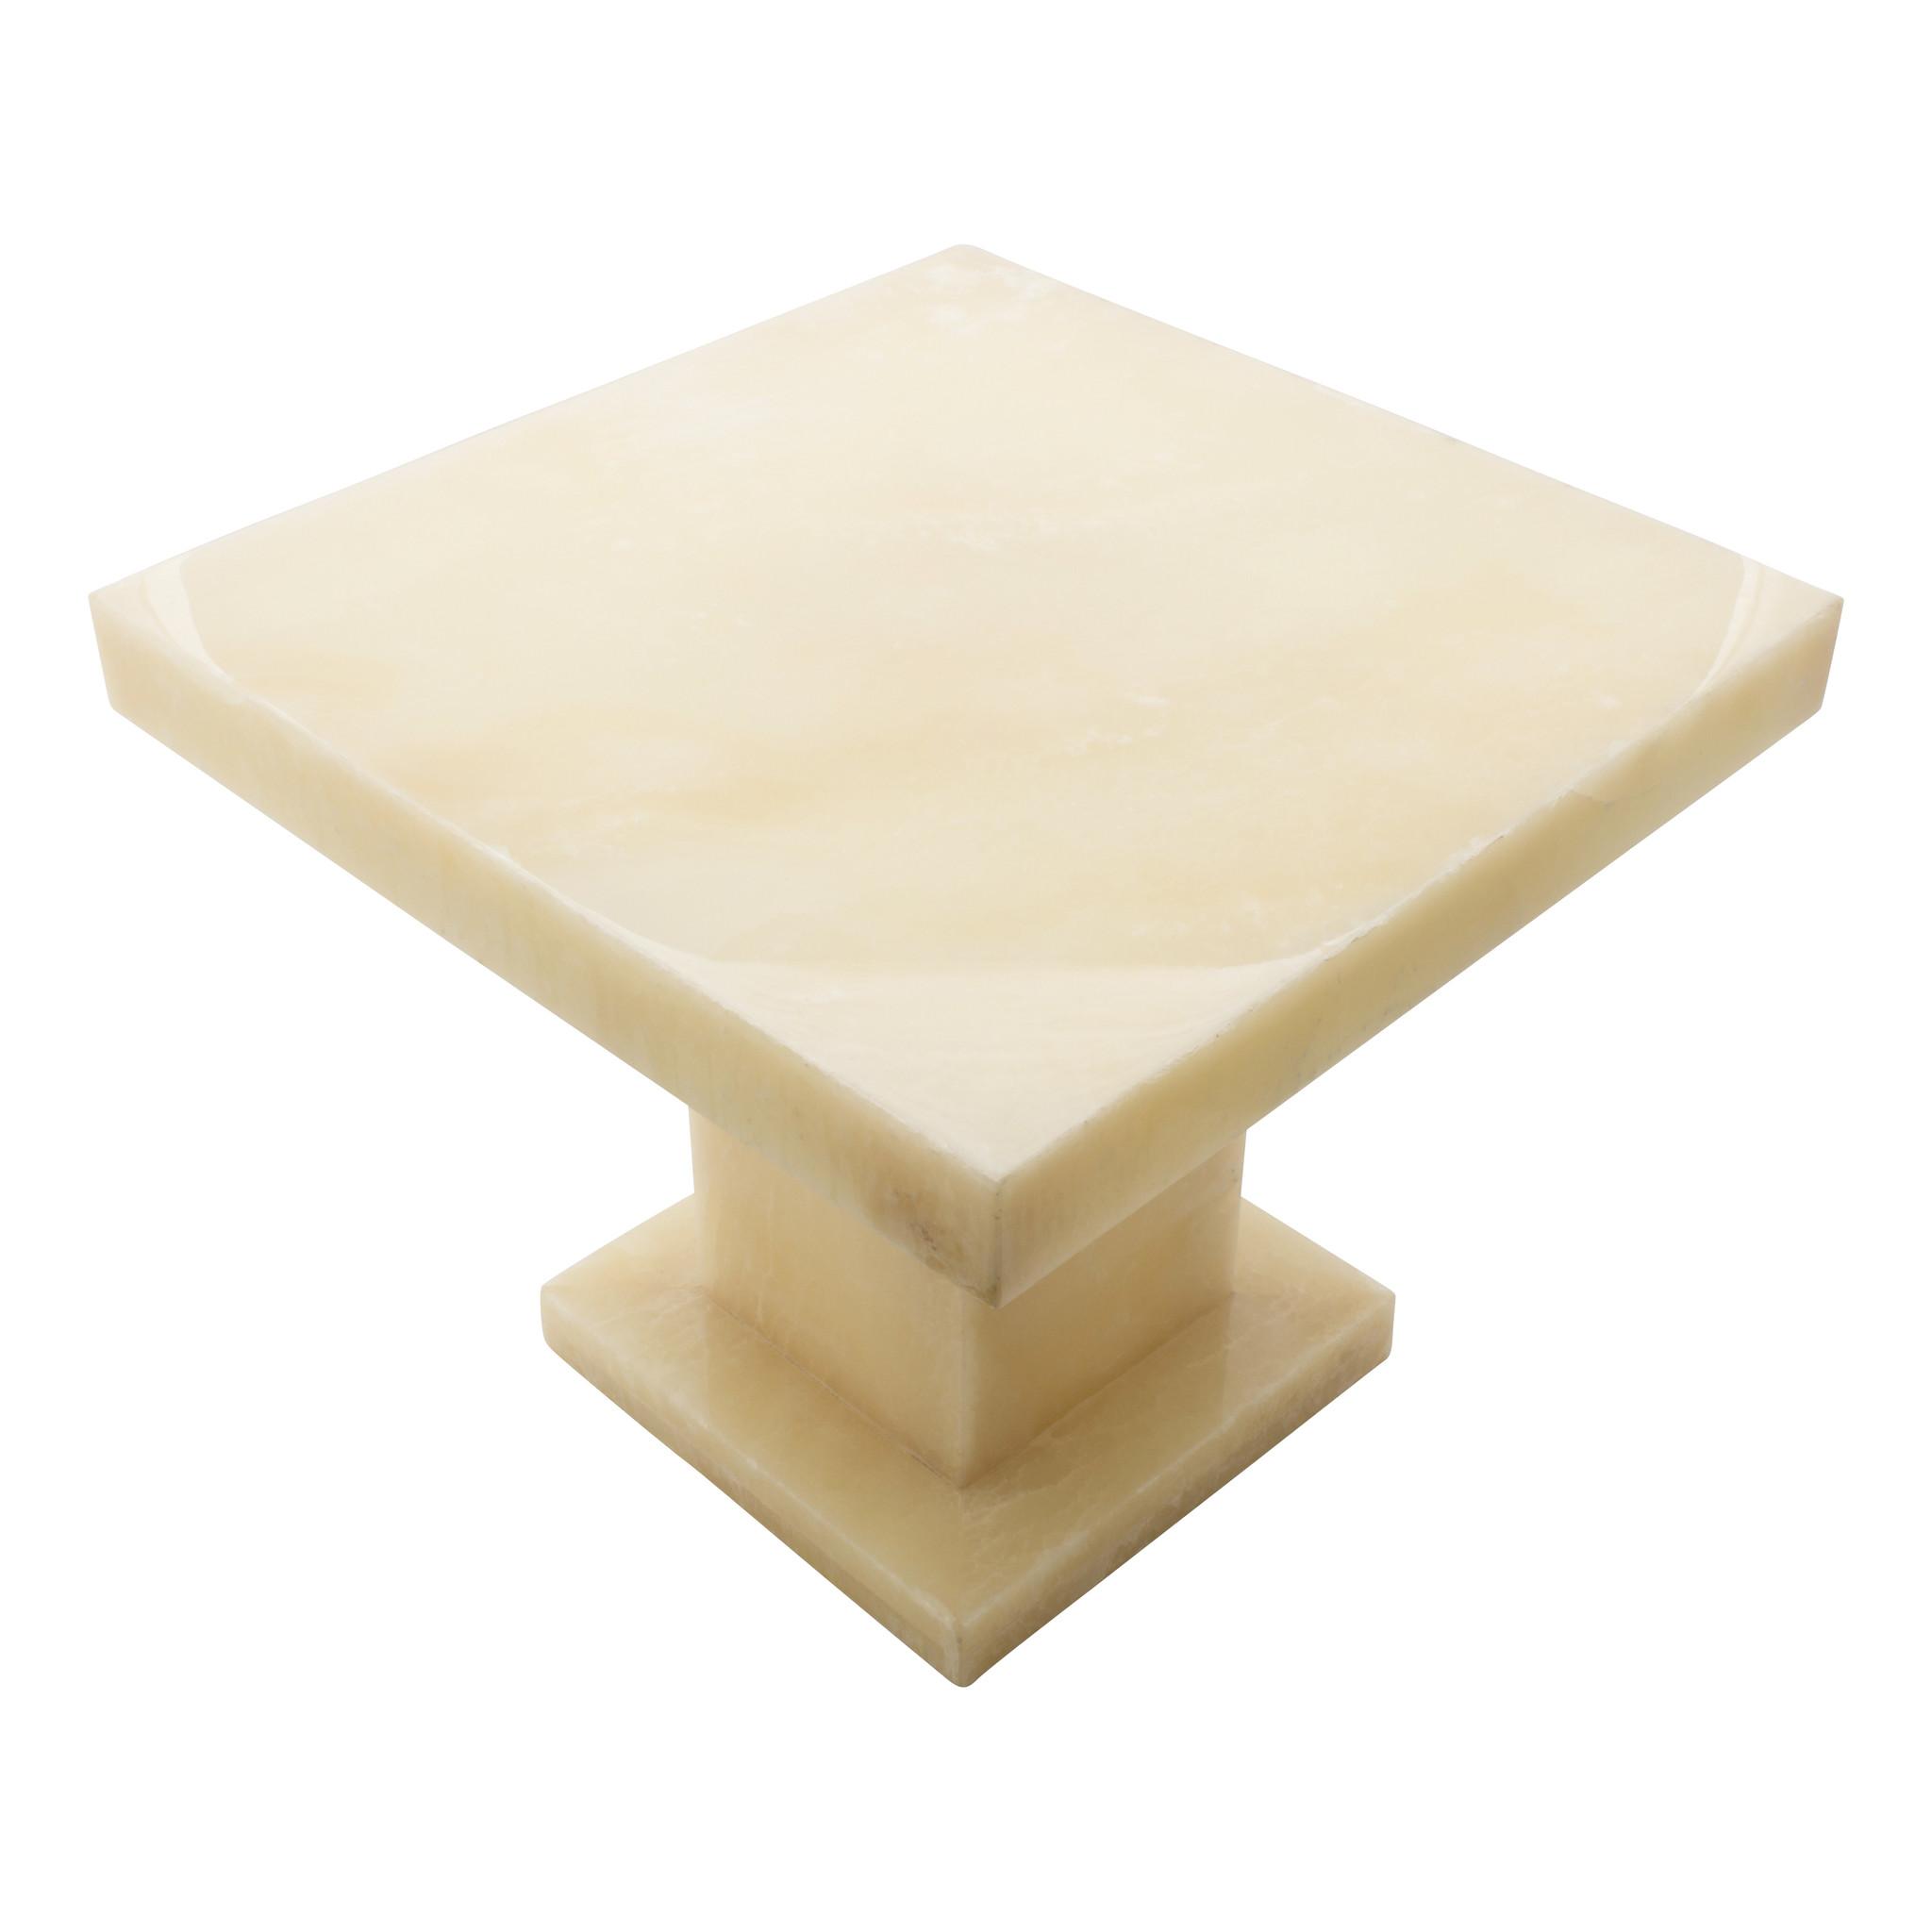 Indomarmer Onyx Beistelltisch Quadrat 50x50x40 cm